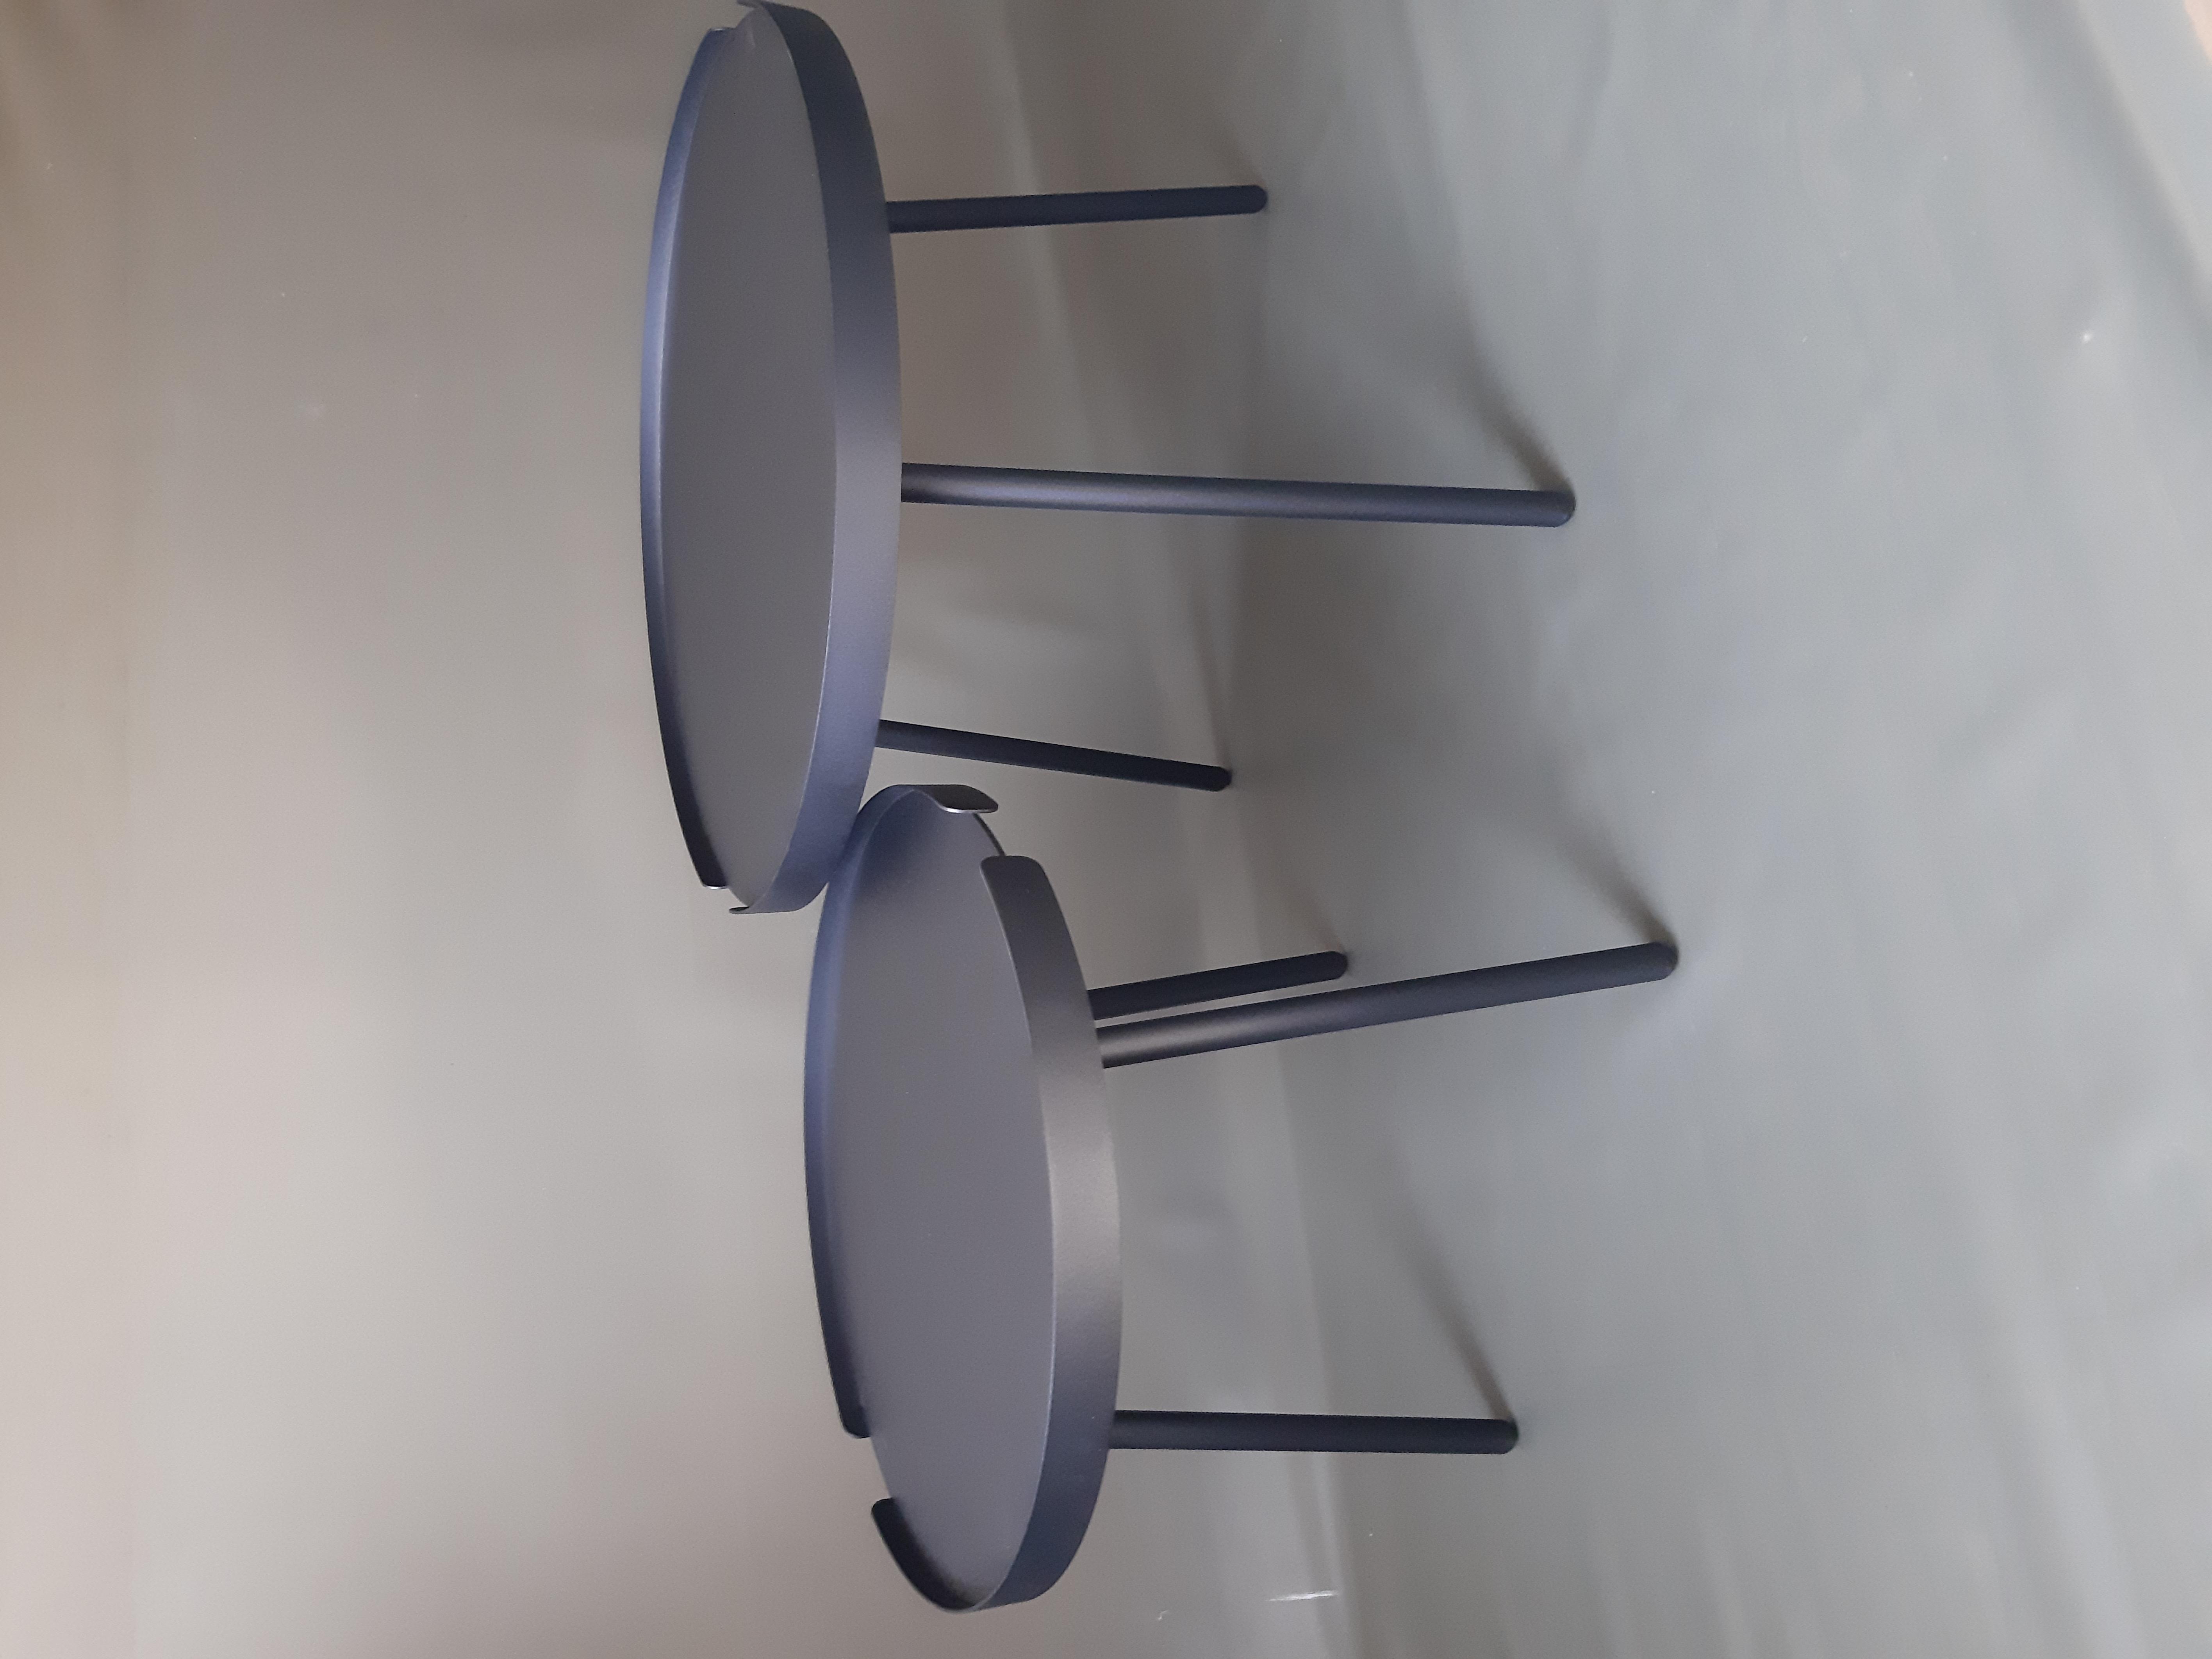 SY-1678 Nesting Tables